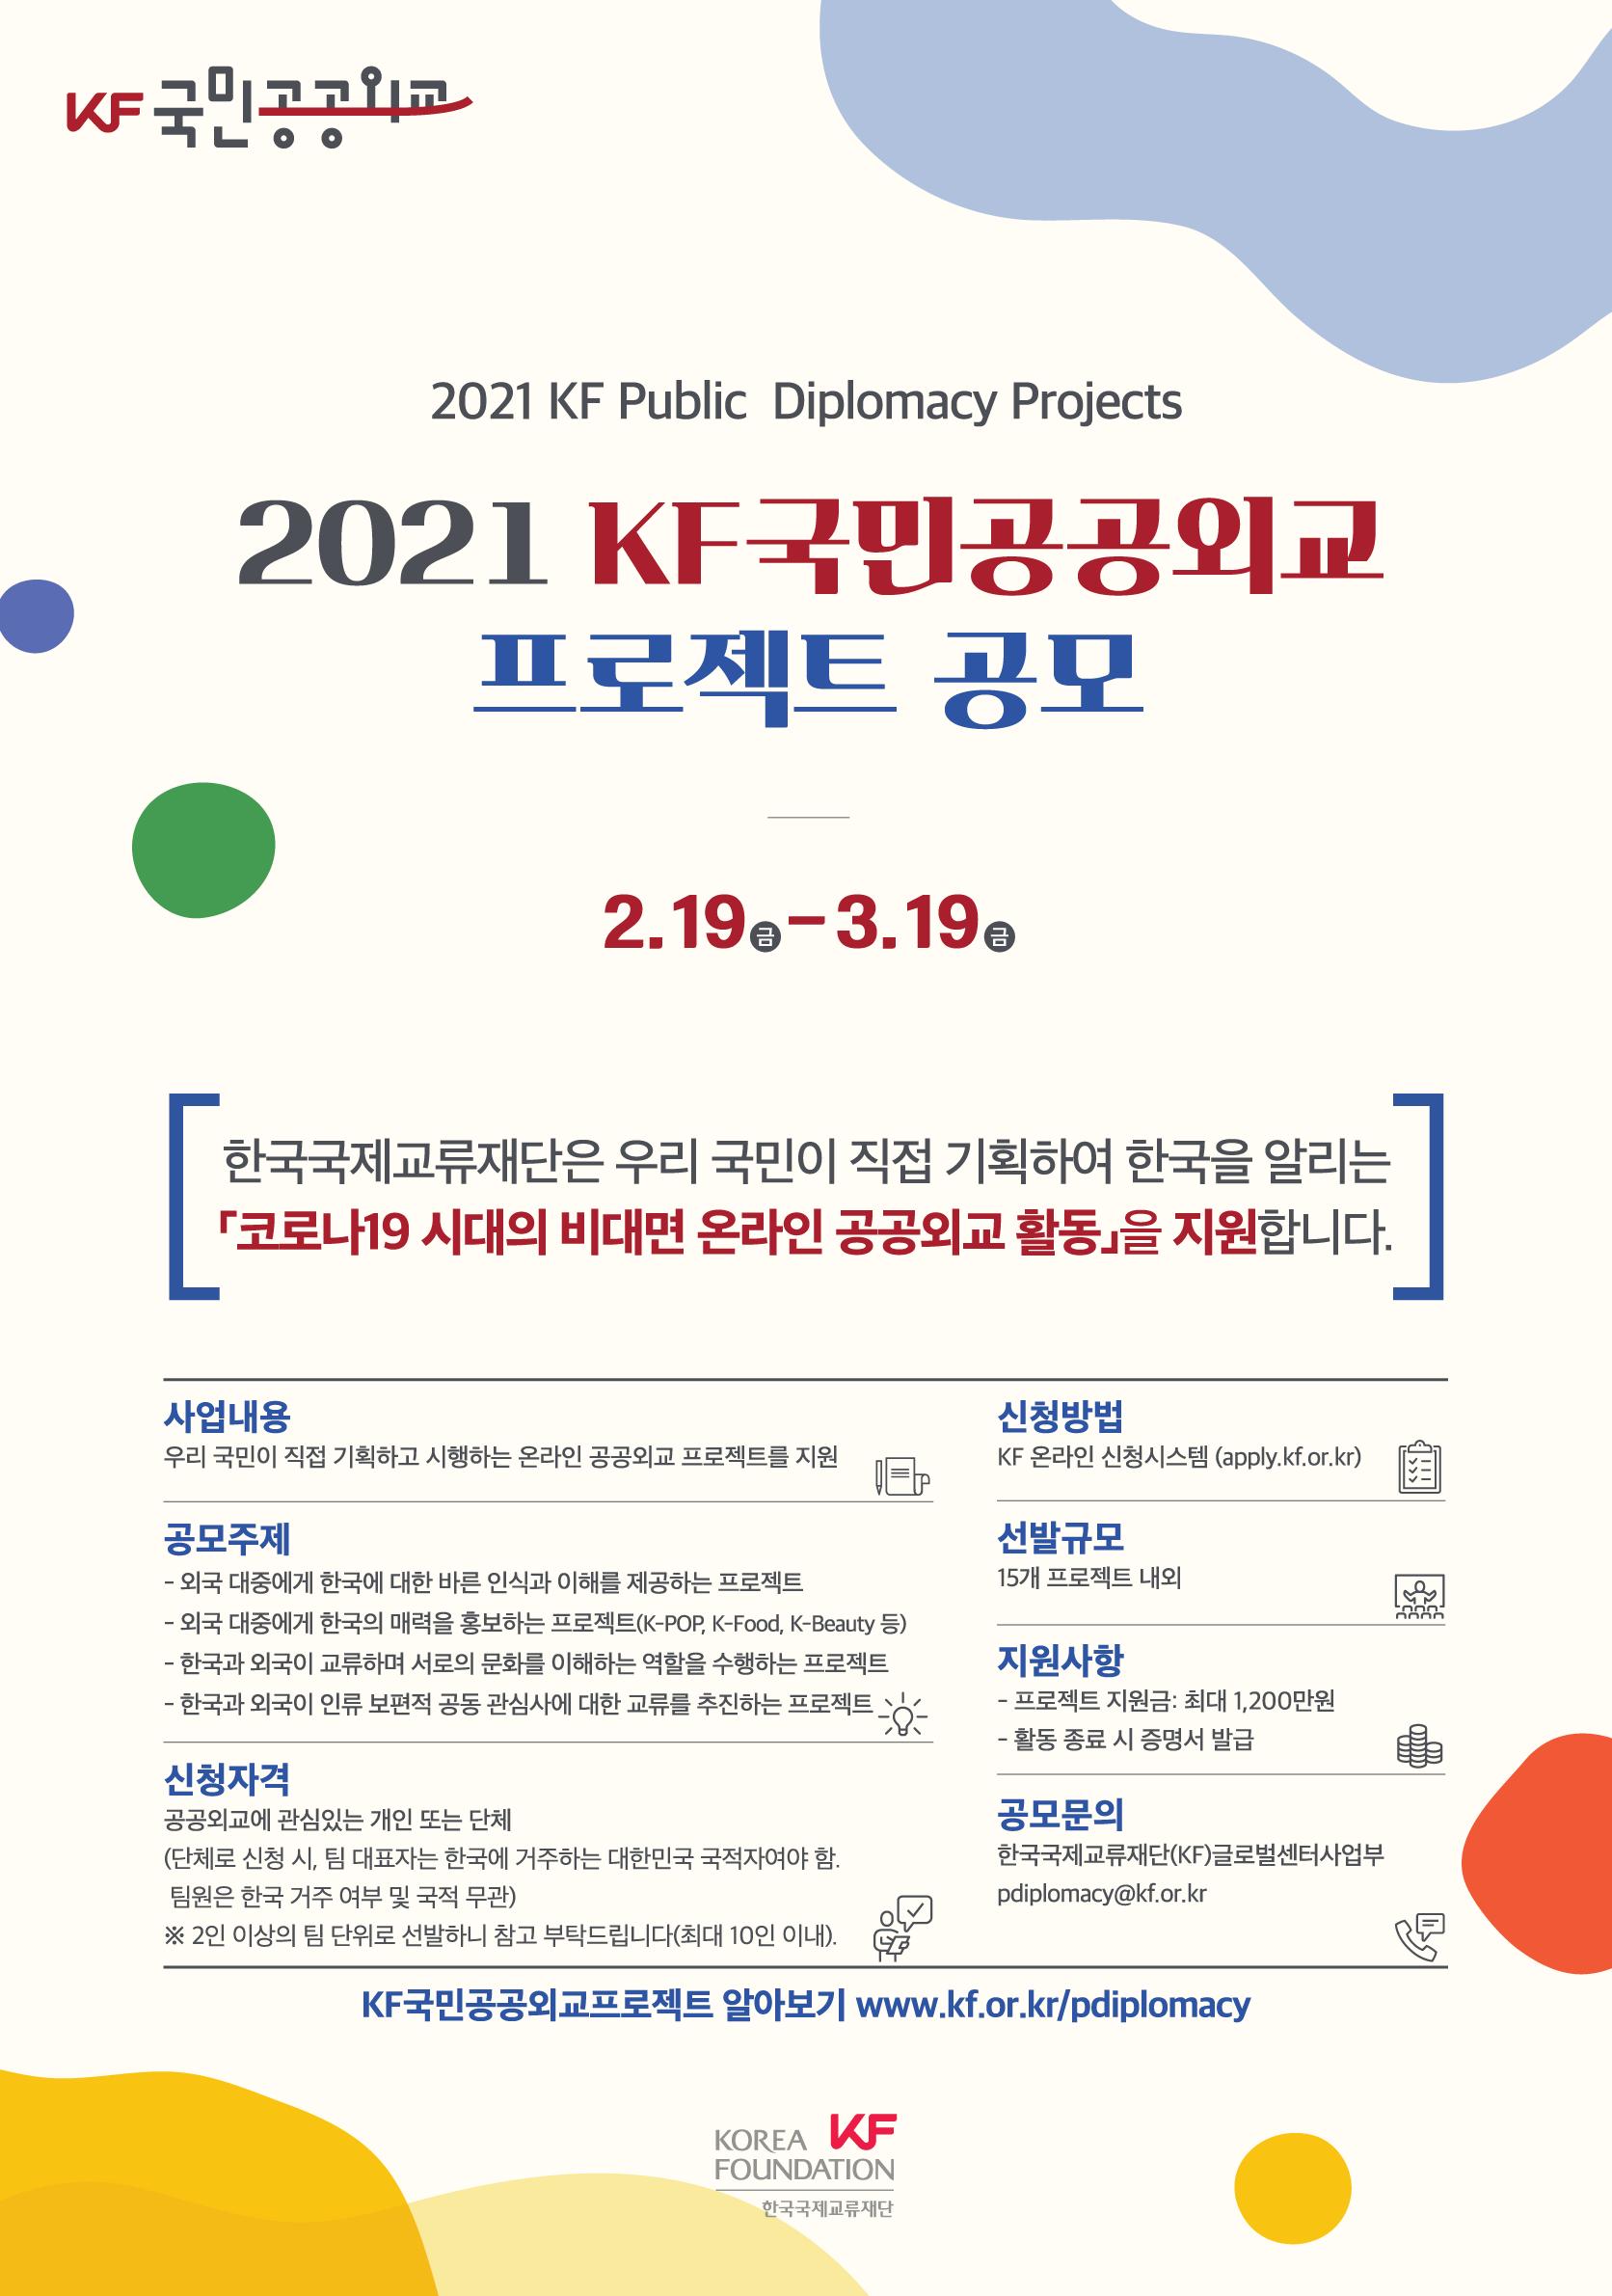 2021 KF 국민공공외교 프로젝트 공모